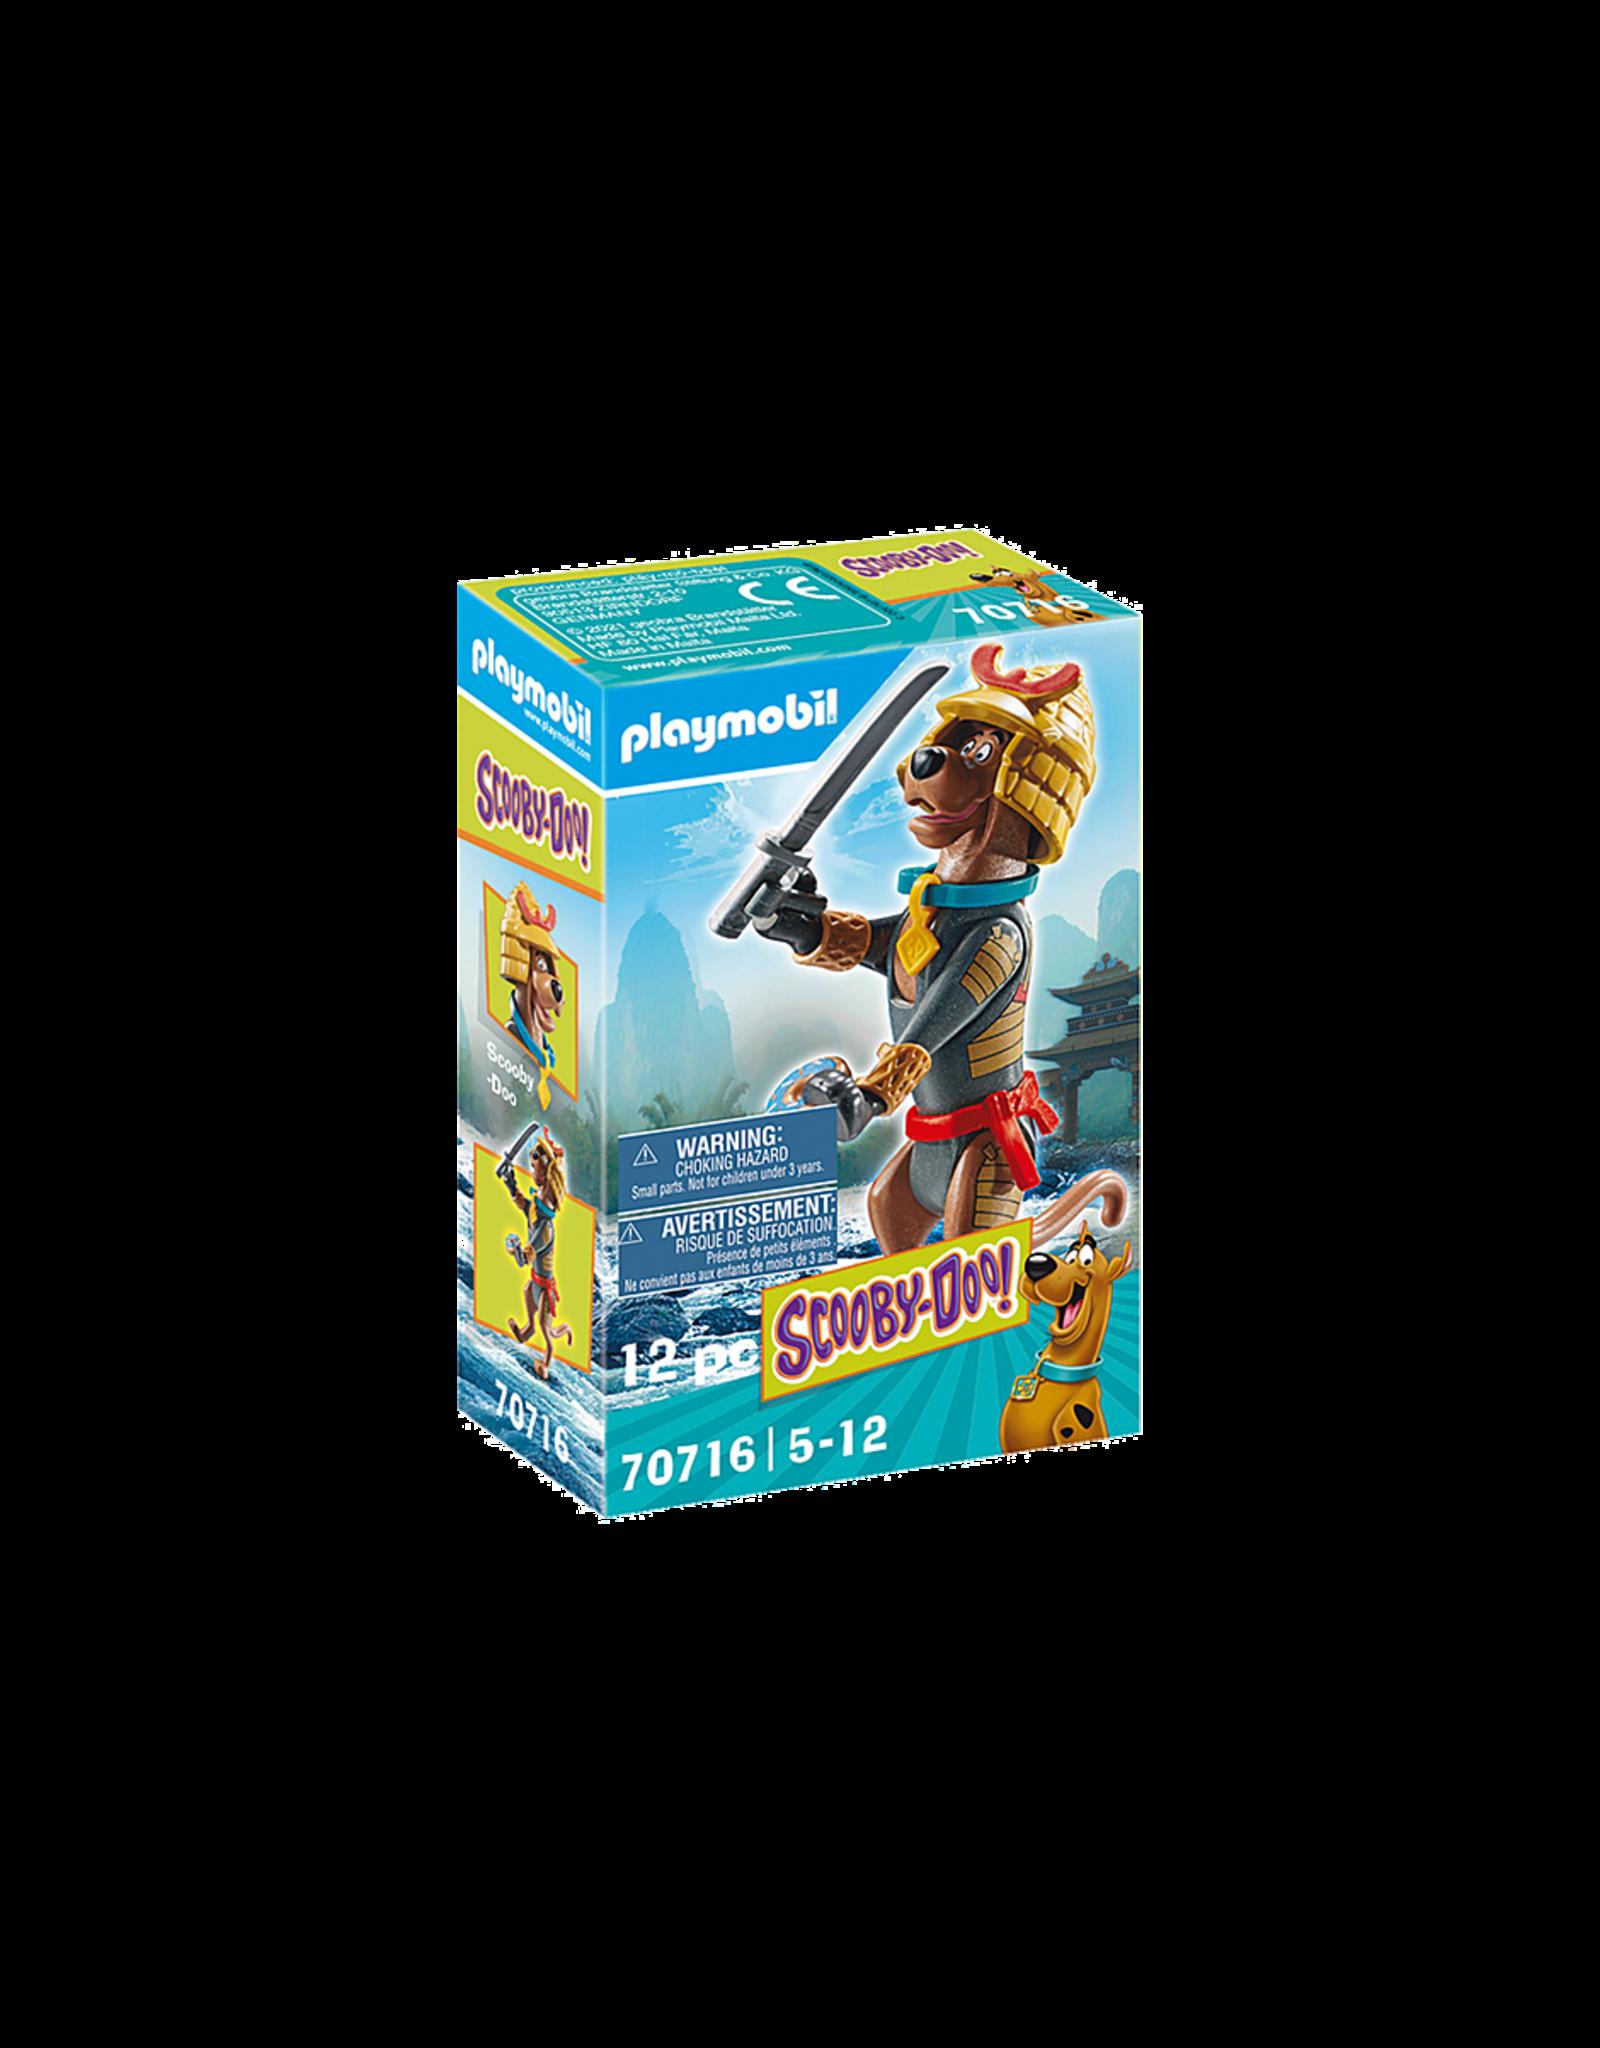 Playmobil Scooby-Doo! Collectible Samurai Figure